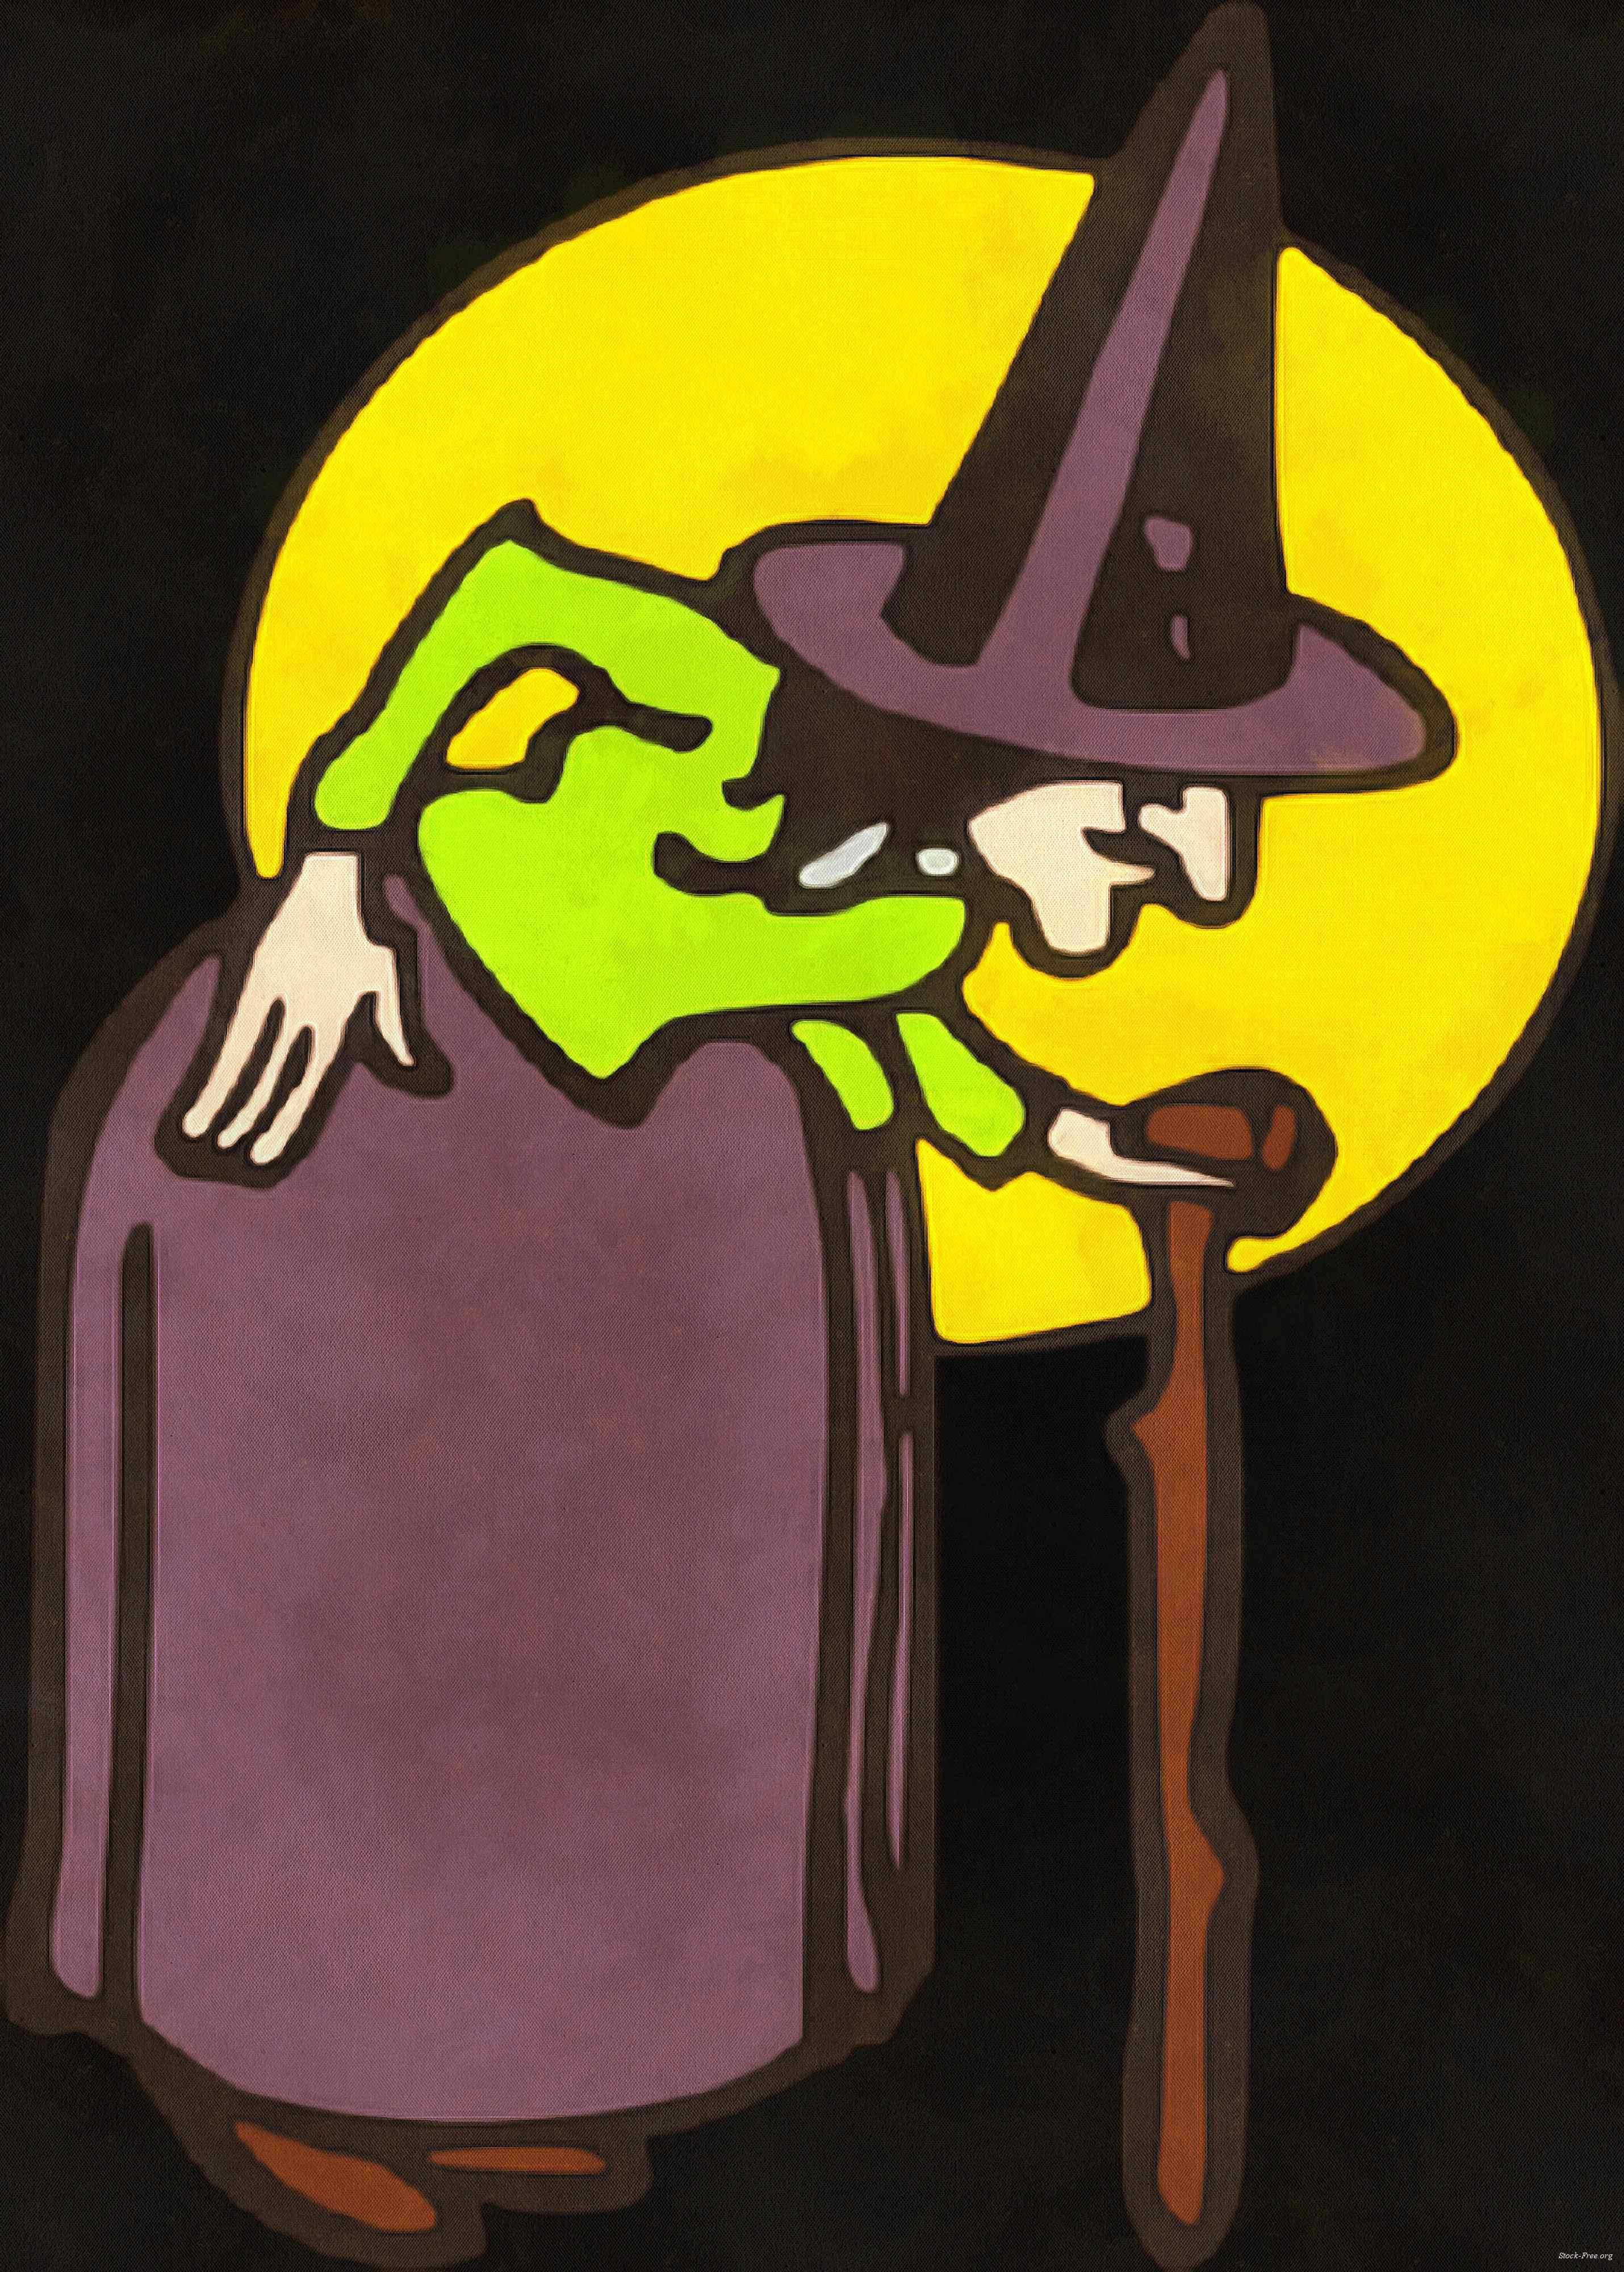 witch, magic, night, lady, moon, magic, hat, dark, spooky, halloween, -  stock free photos, public domain images, download free images, free stock images, public domain